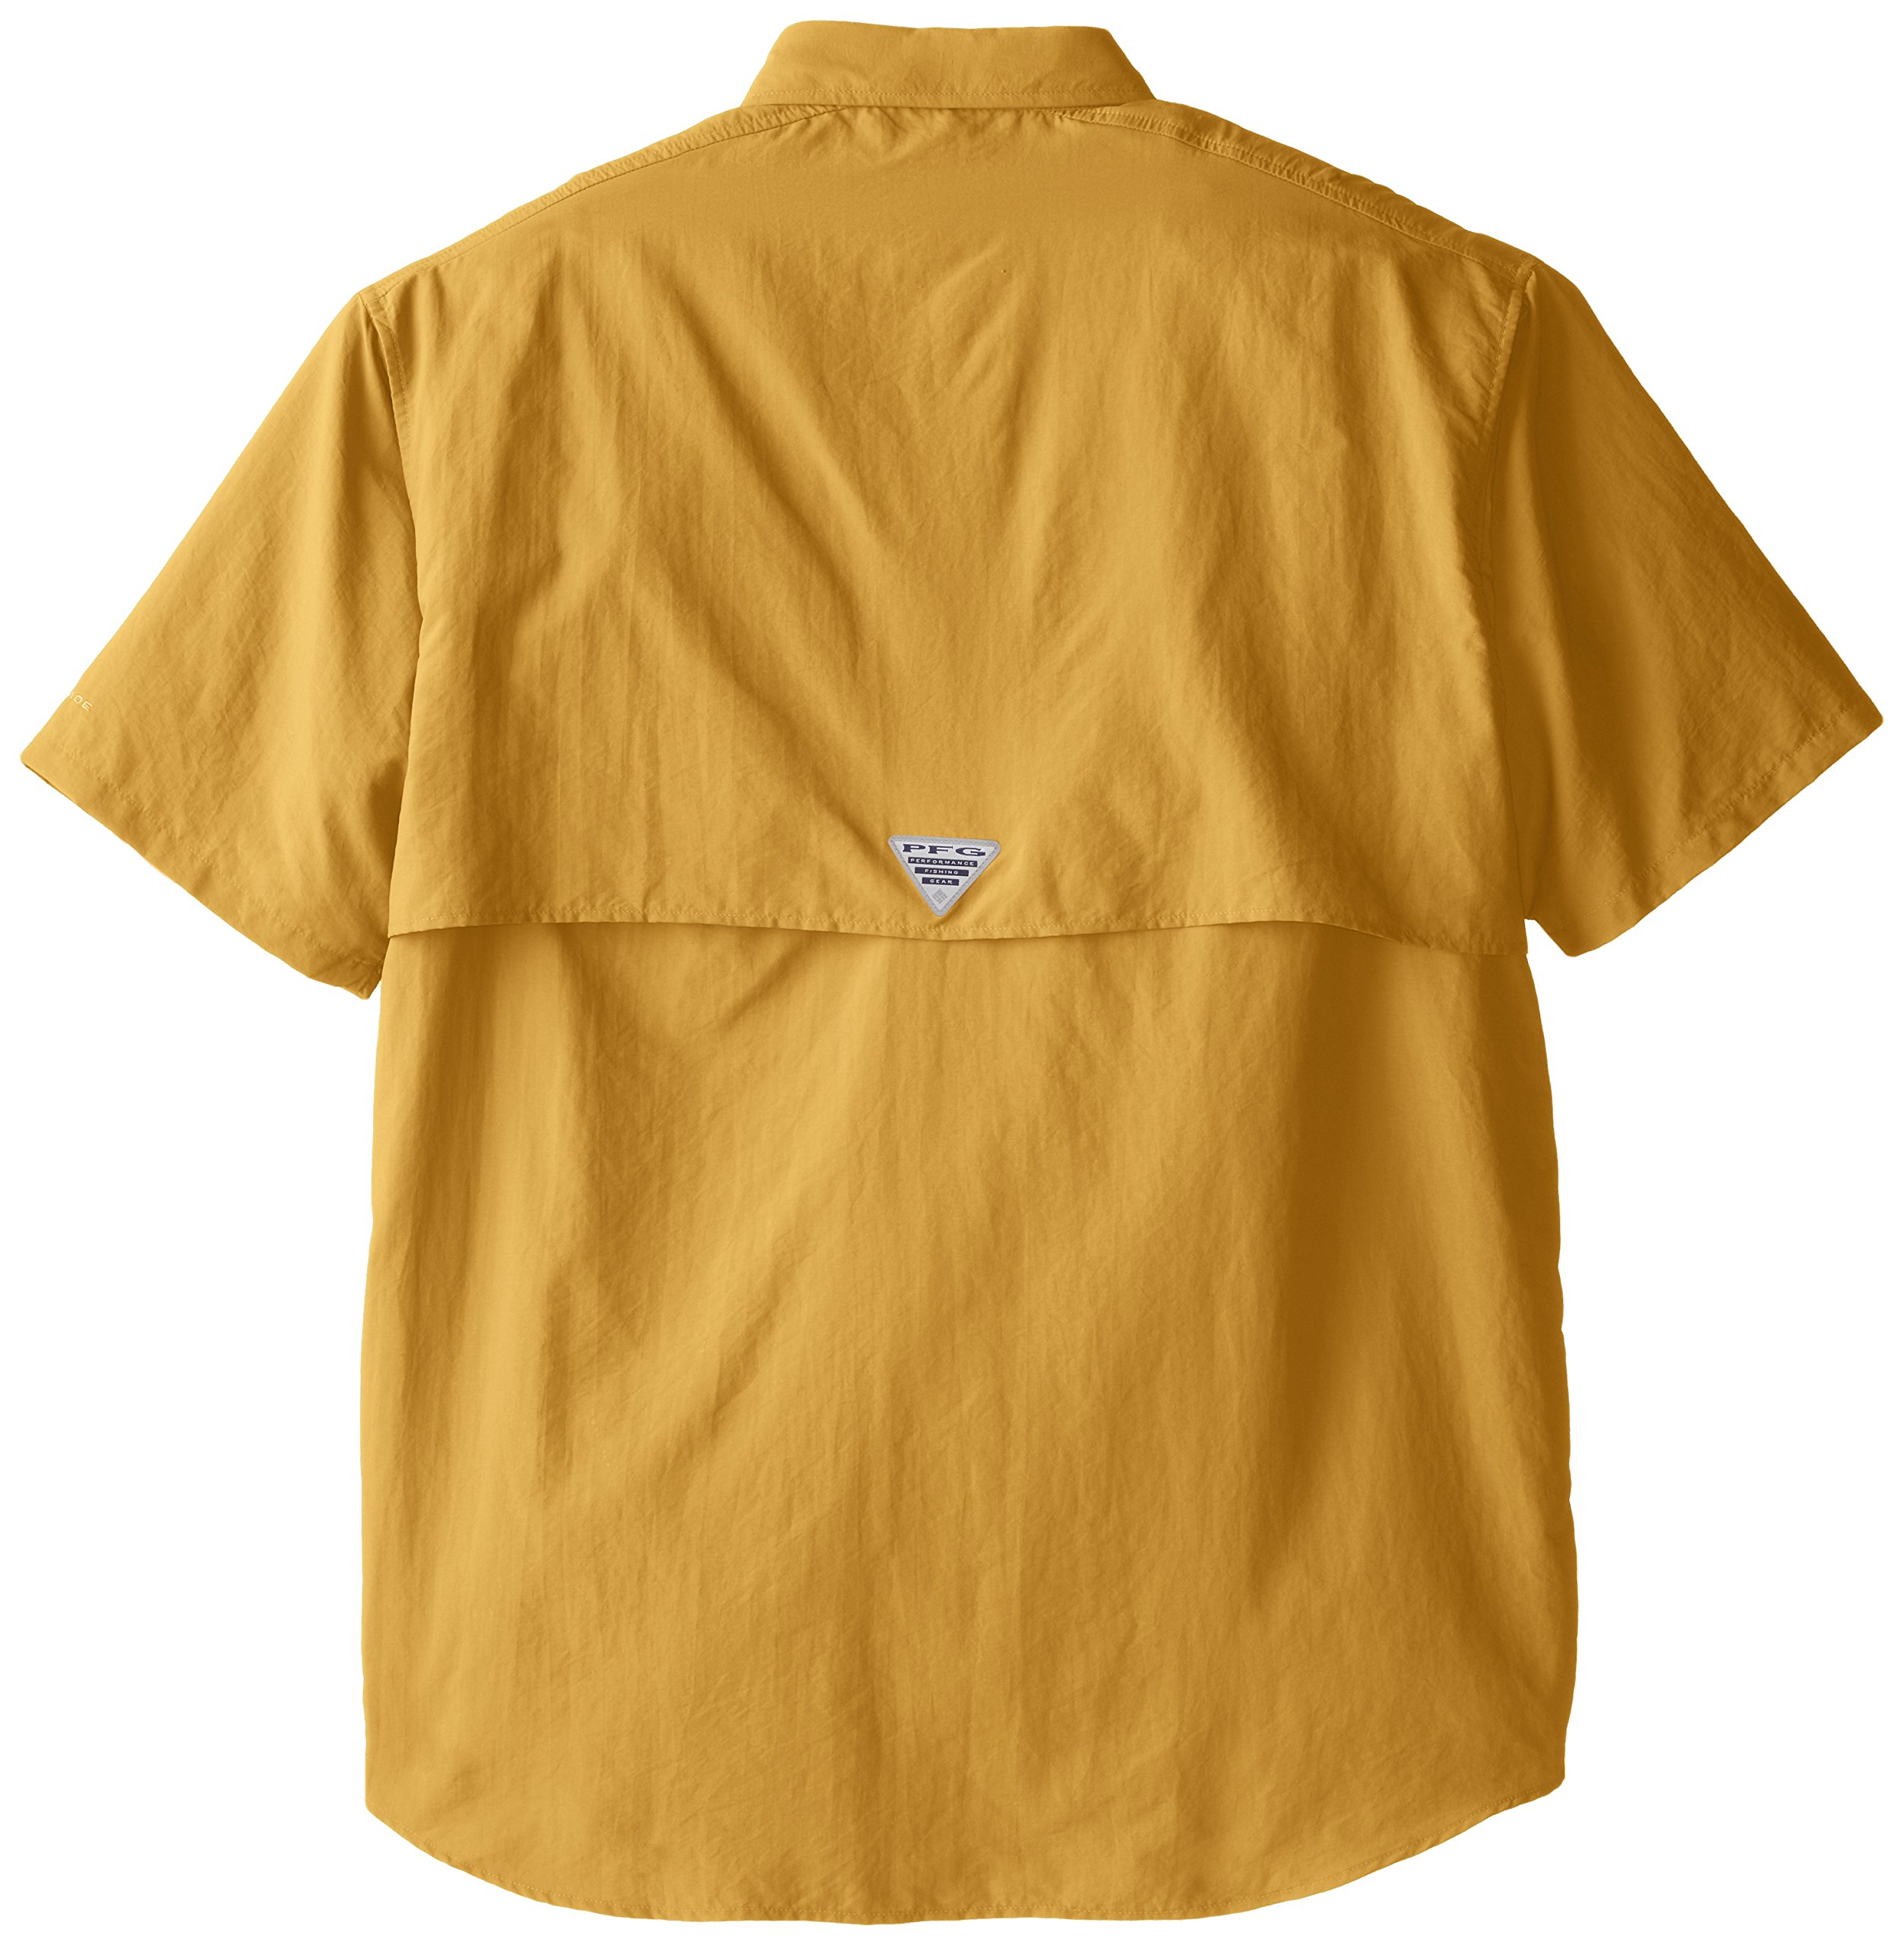 Columbia-Men-039-s-PFG-Bahama-II-Short-Sleeve-Shirt-T-Choose-SZ-color thumbnail 5